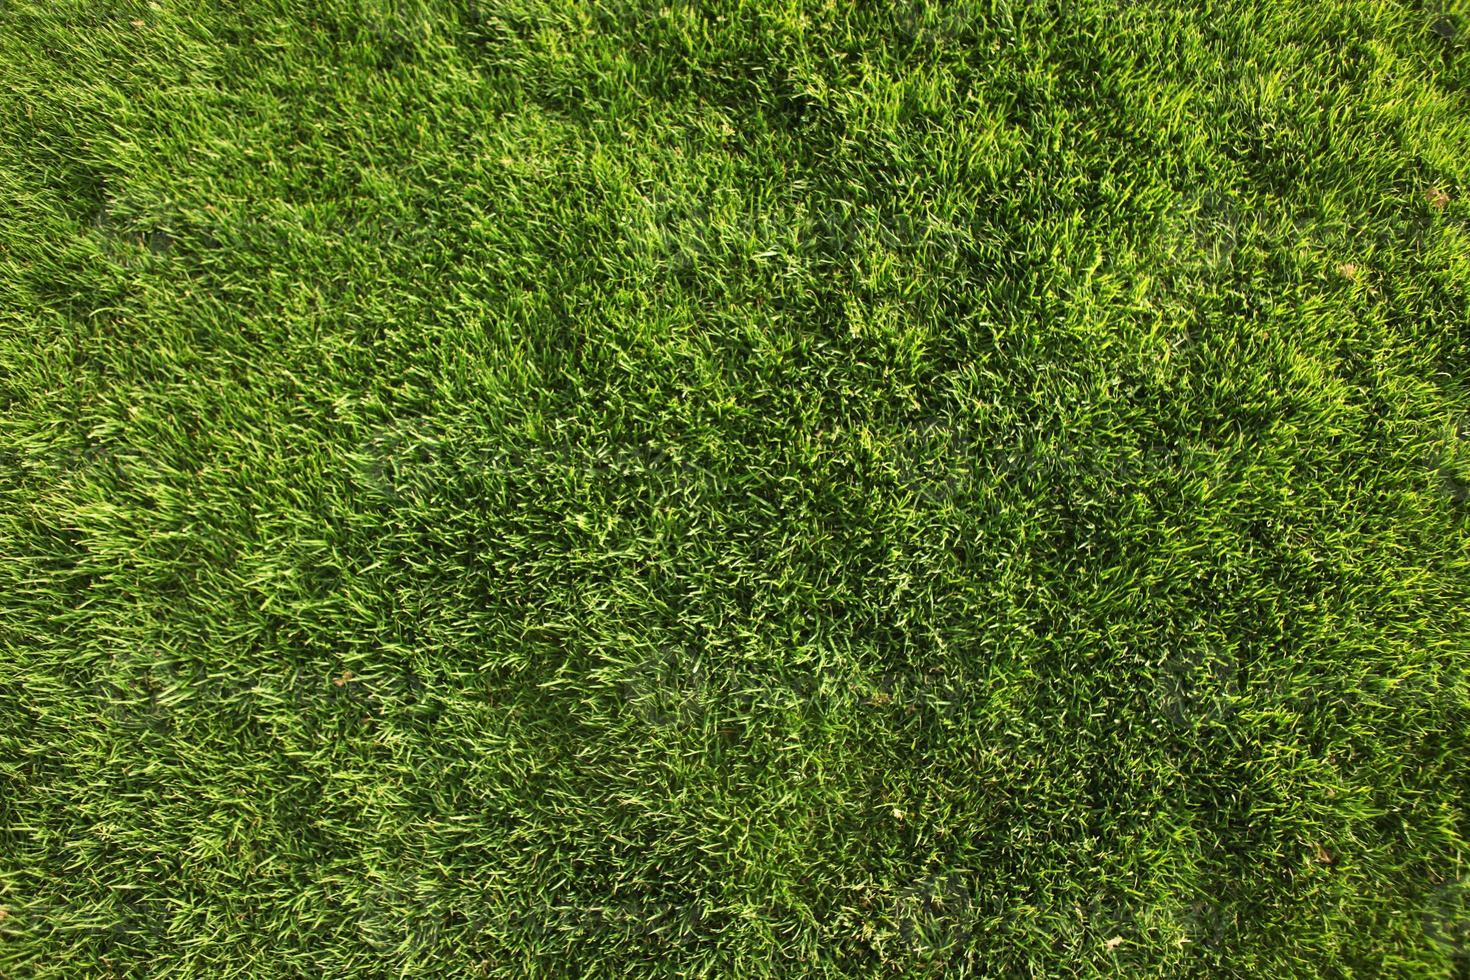 Fondo o textura de hierba verde perfecta foto